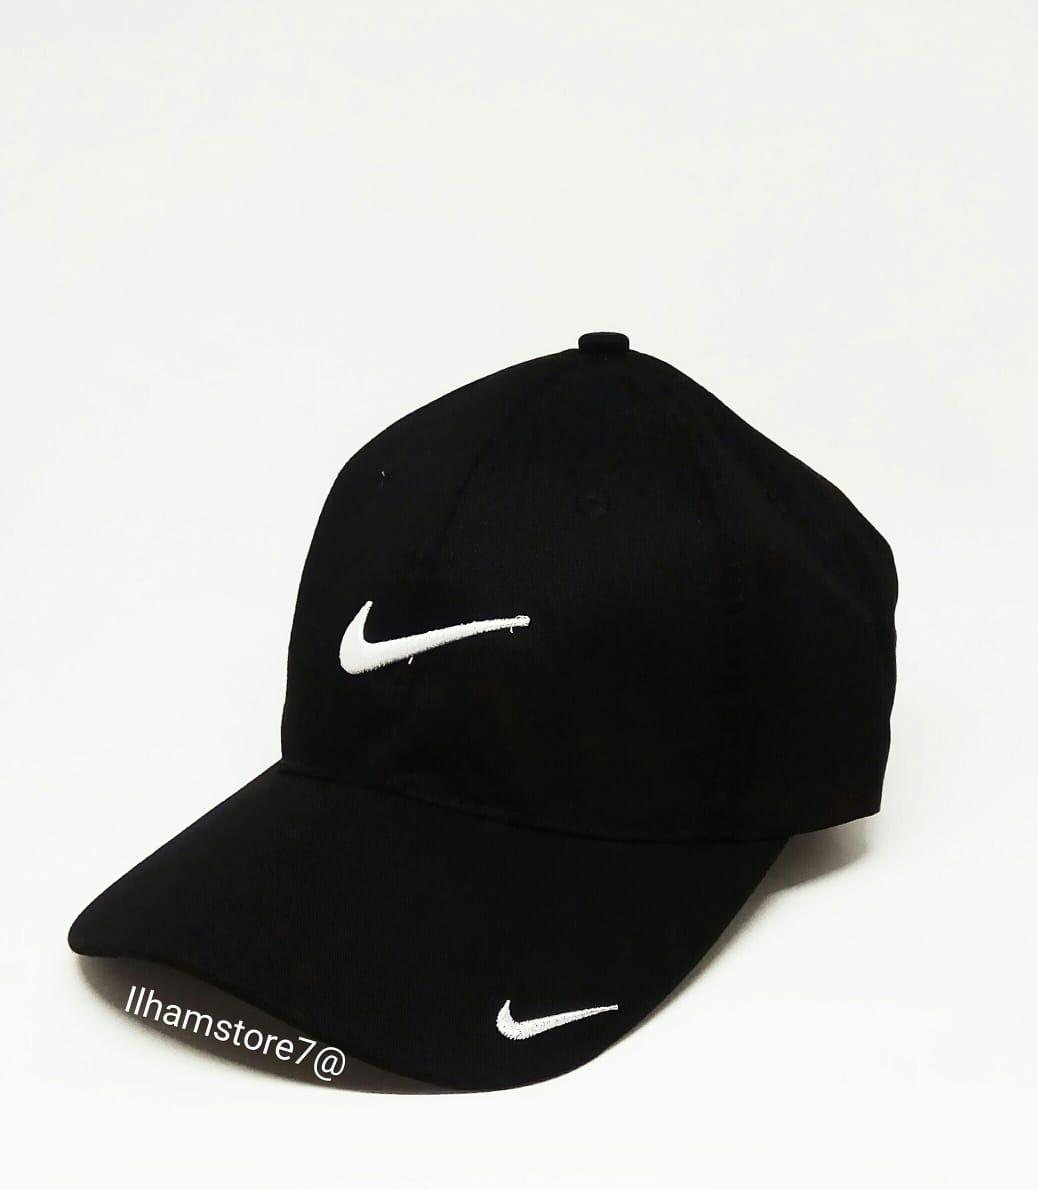 [cod]topi distro pria/topi snapback bordir original terlaris/topi distro keren